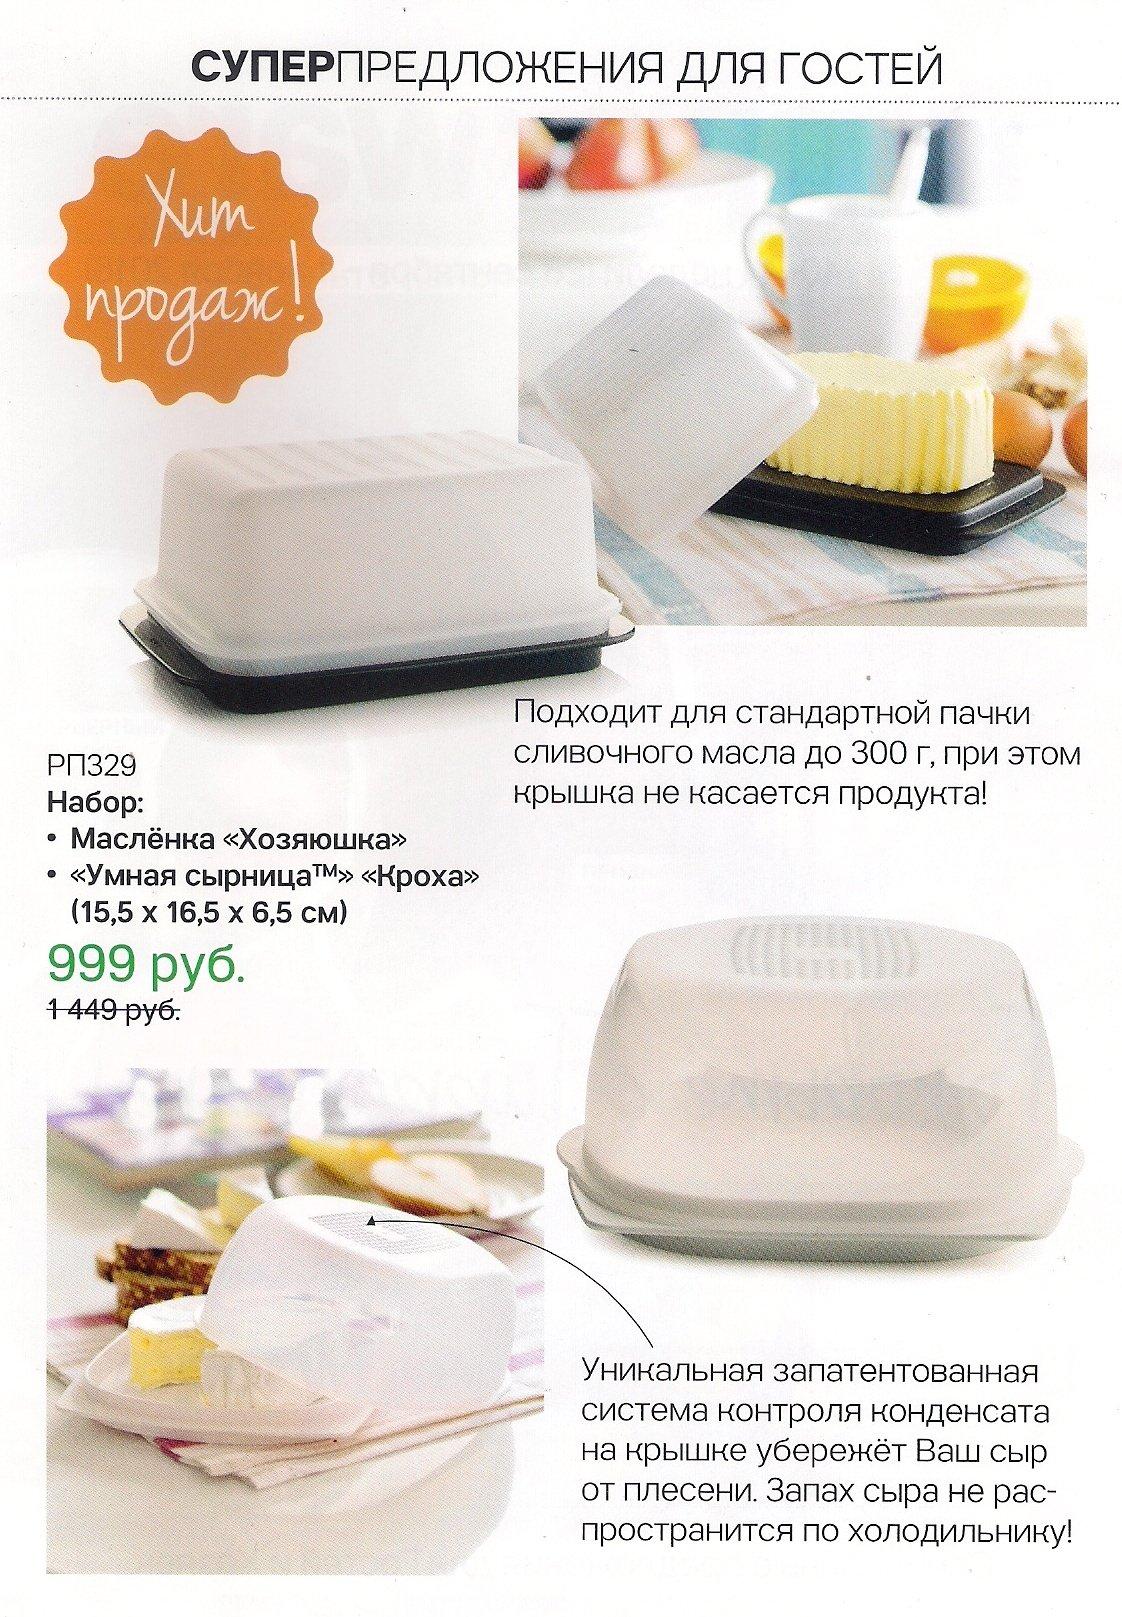 http://tupperware-online.ru/images/upload/7d.jpg